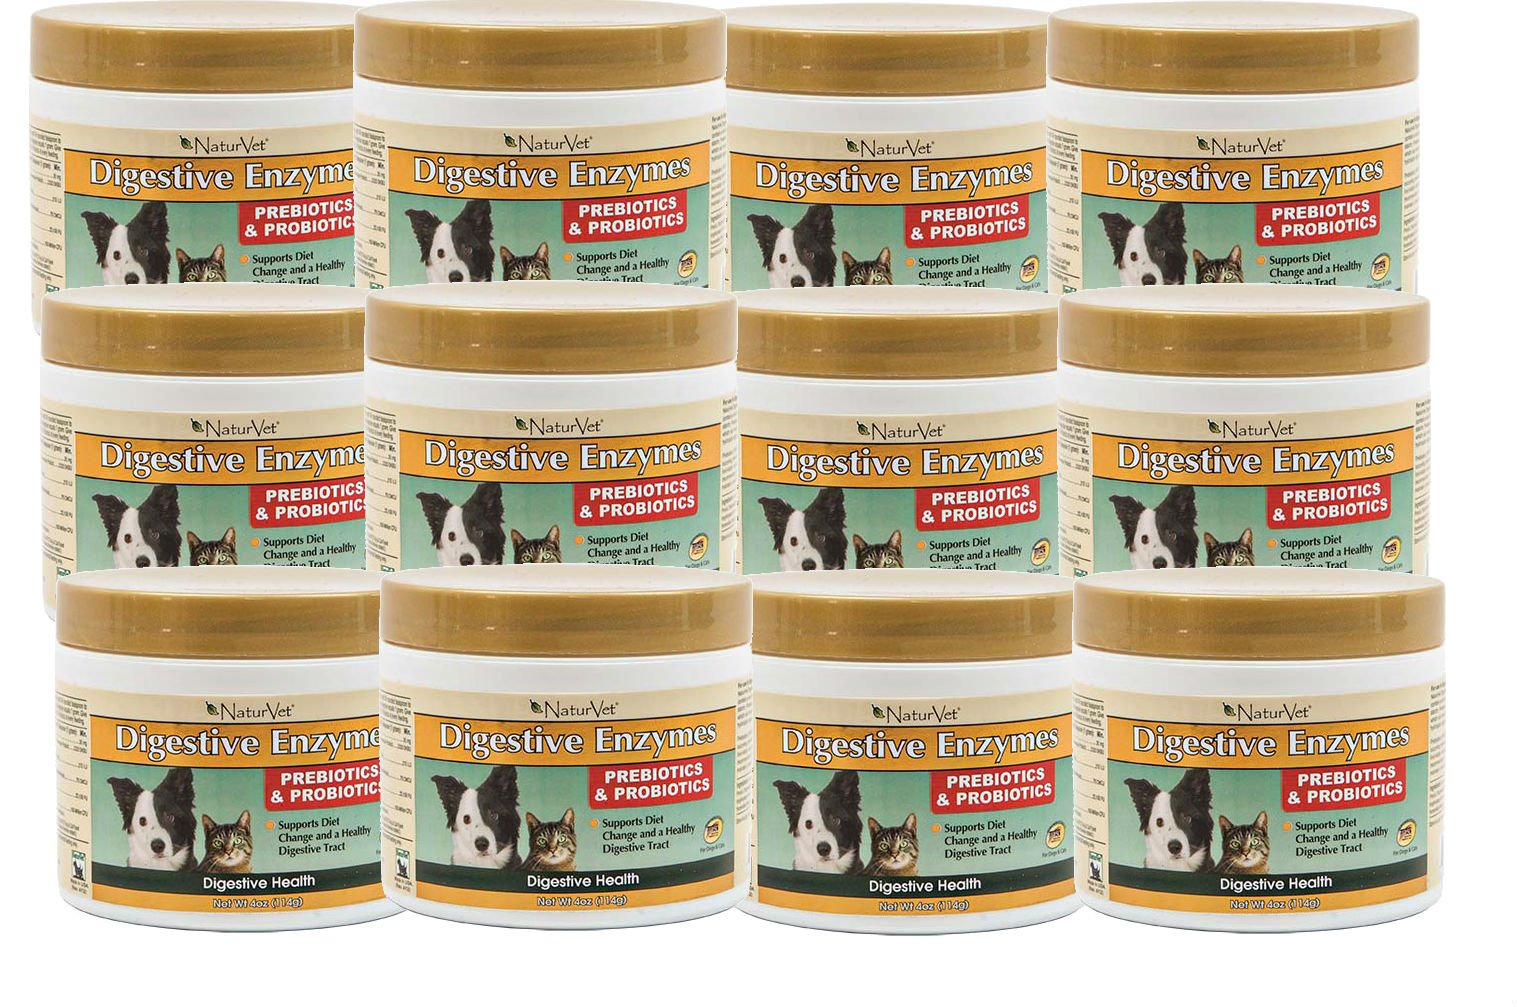 NaturVet DIGESTIVE ENZYMES & PROBIOTICS Healthy Digestion Dogs & Cat 4oz 12PACK by NaturVet